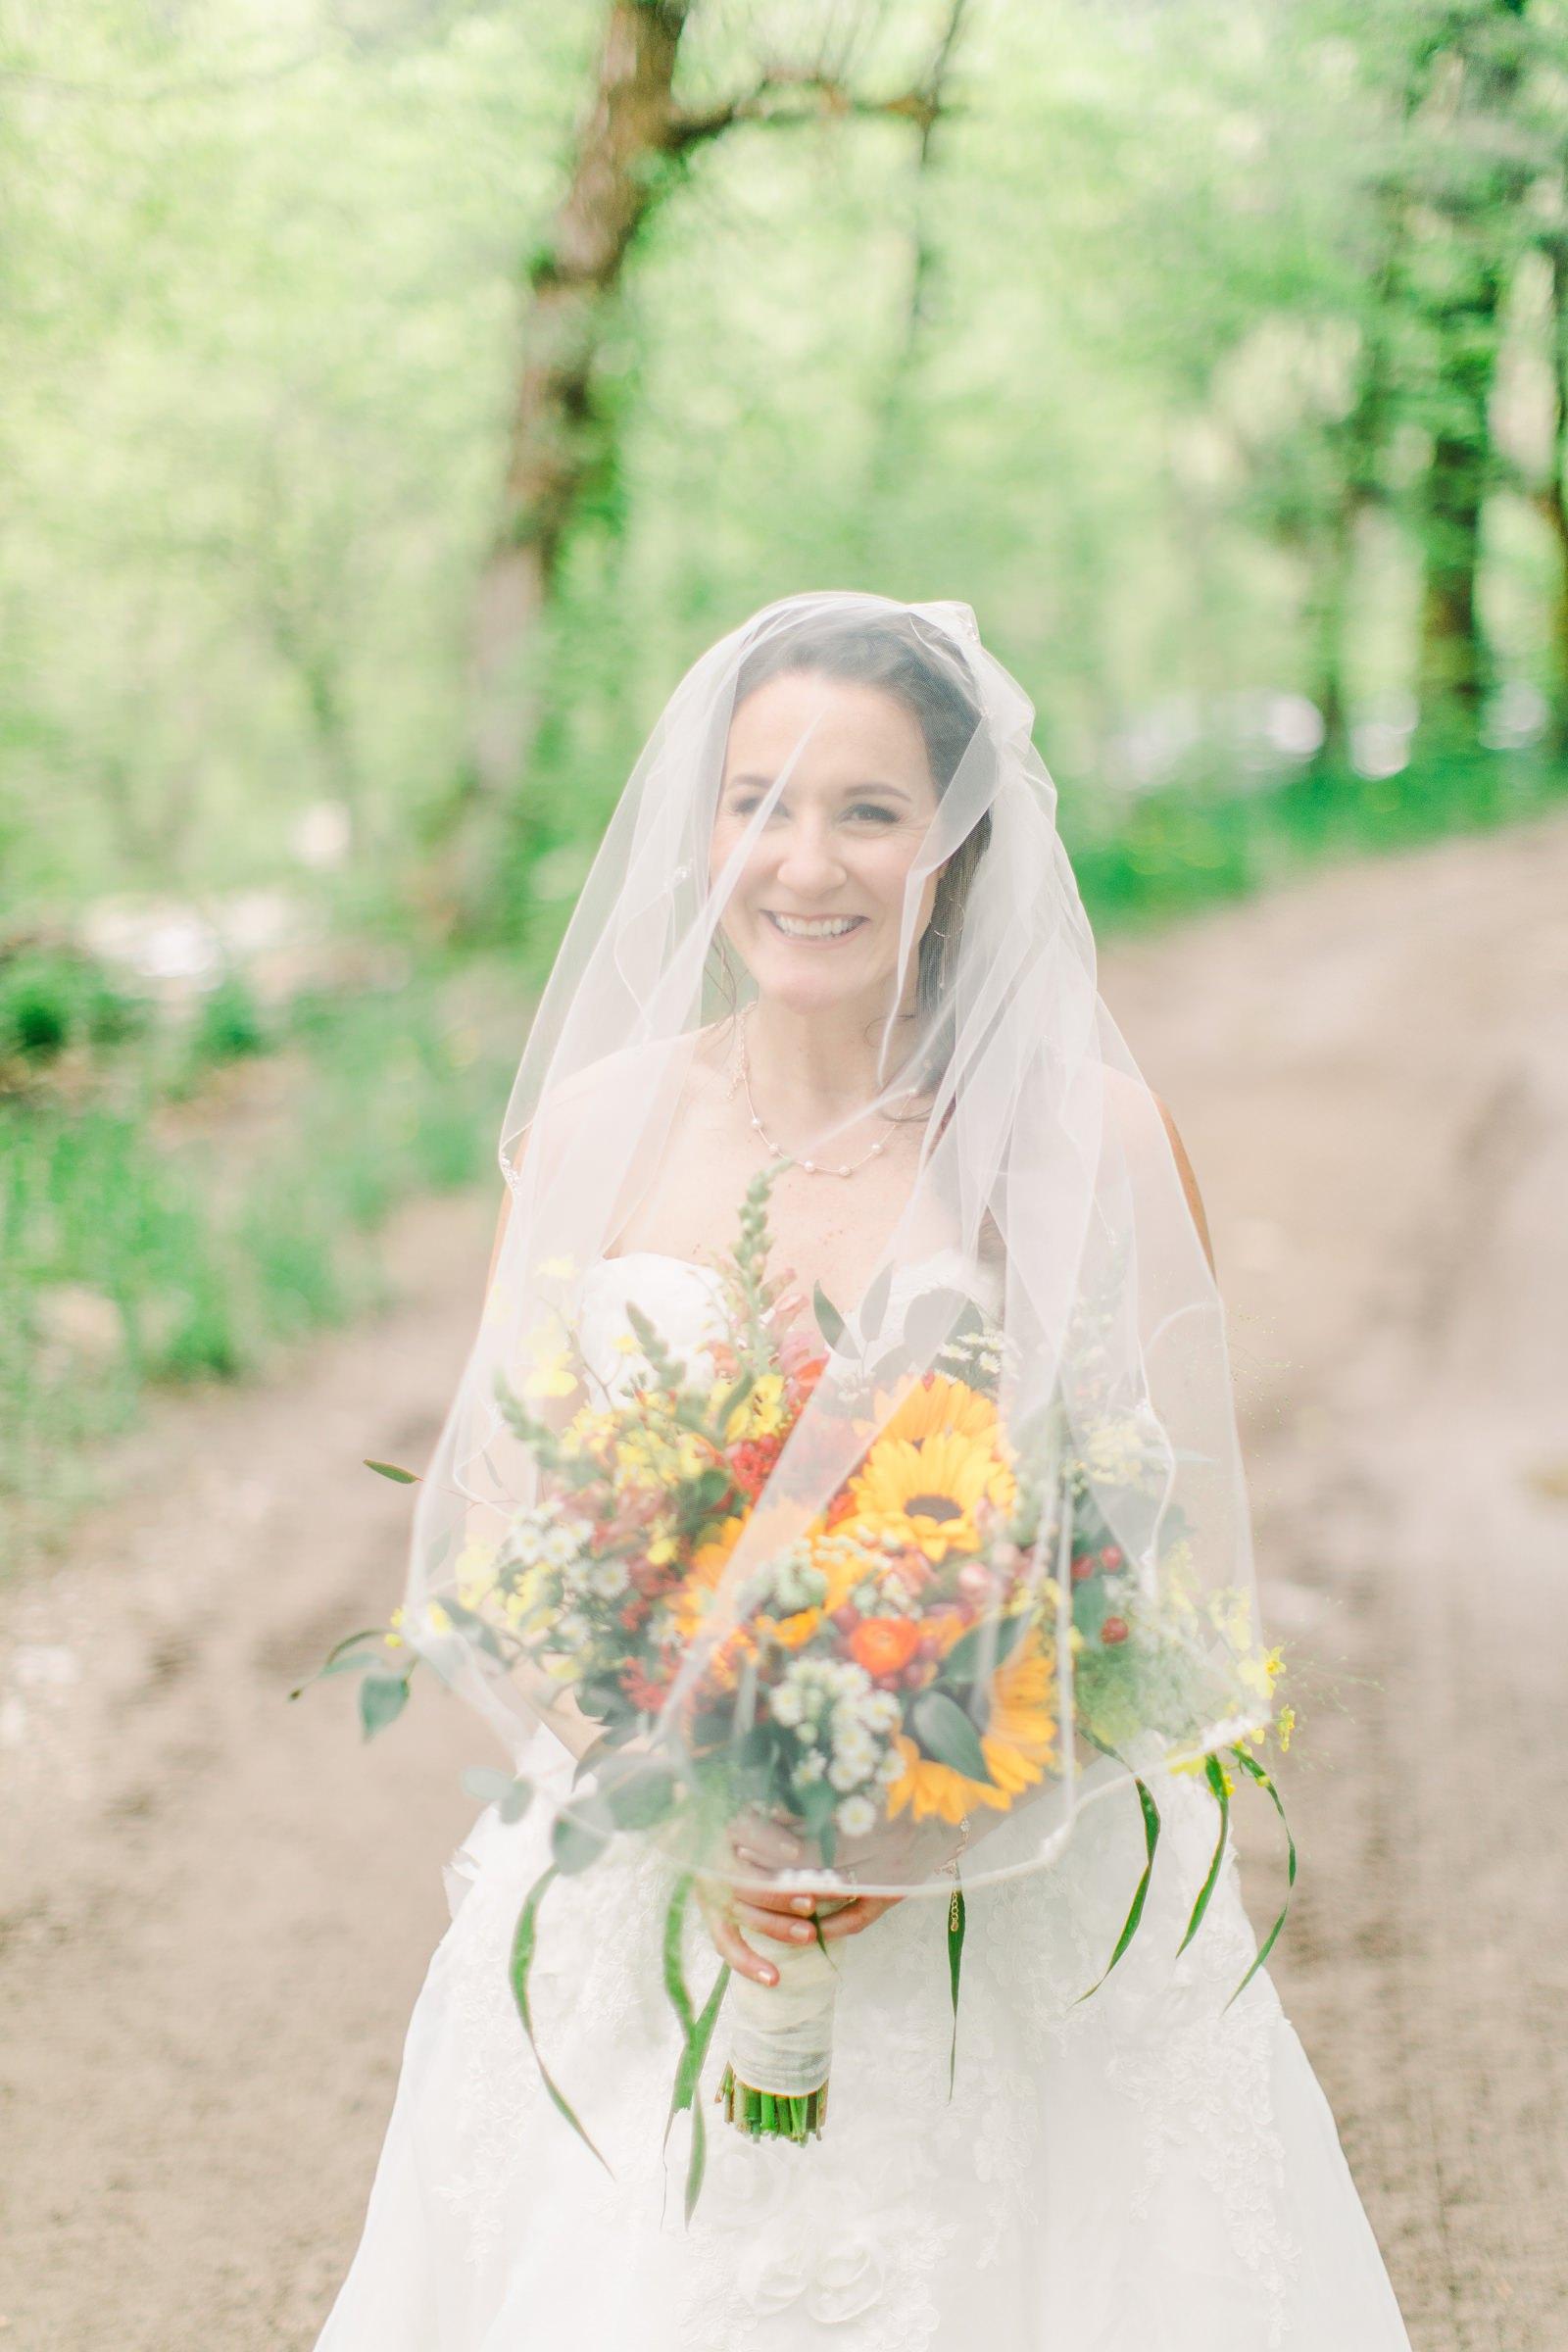 Millcreek Inn Summer Wedding, Utah wedding photography Millcreek Canyon, Salt Lake City, bride under long veil